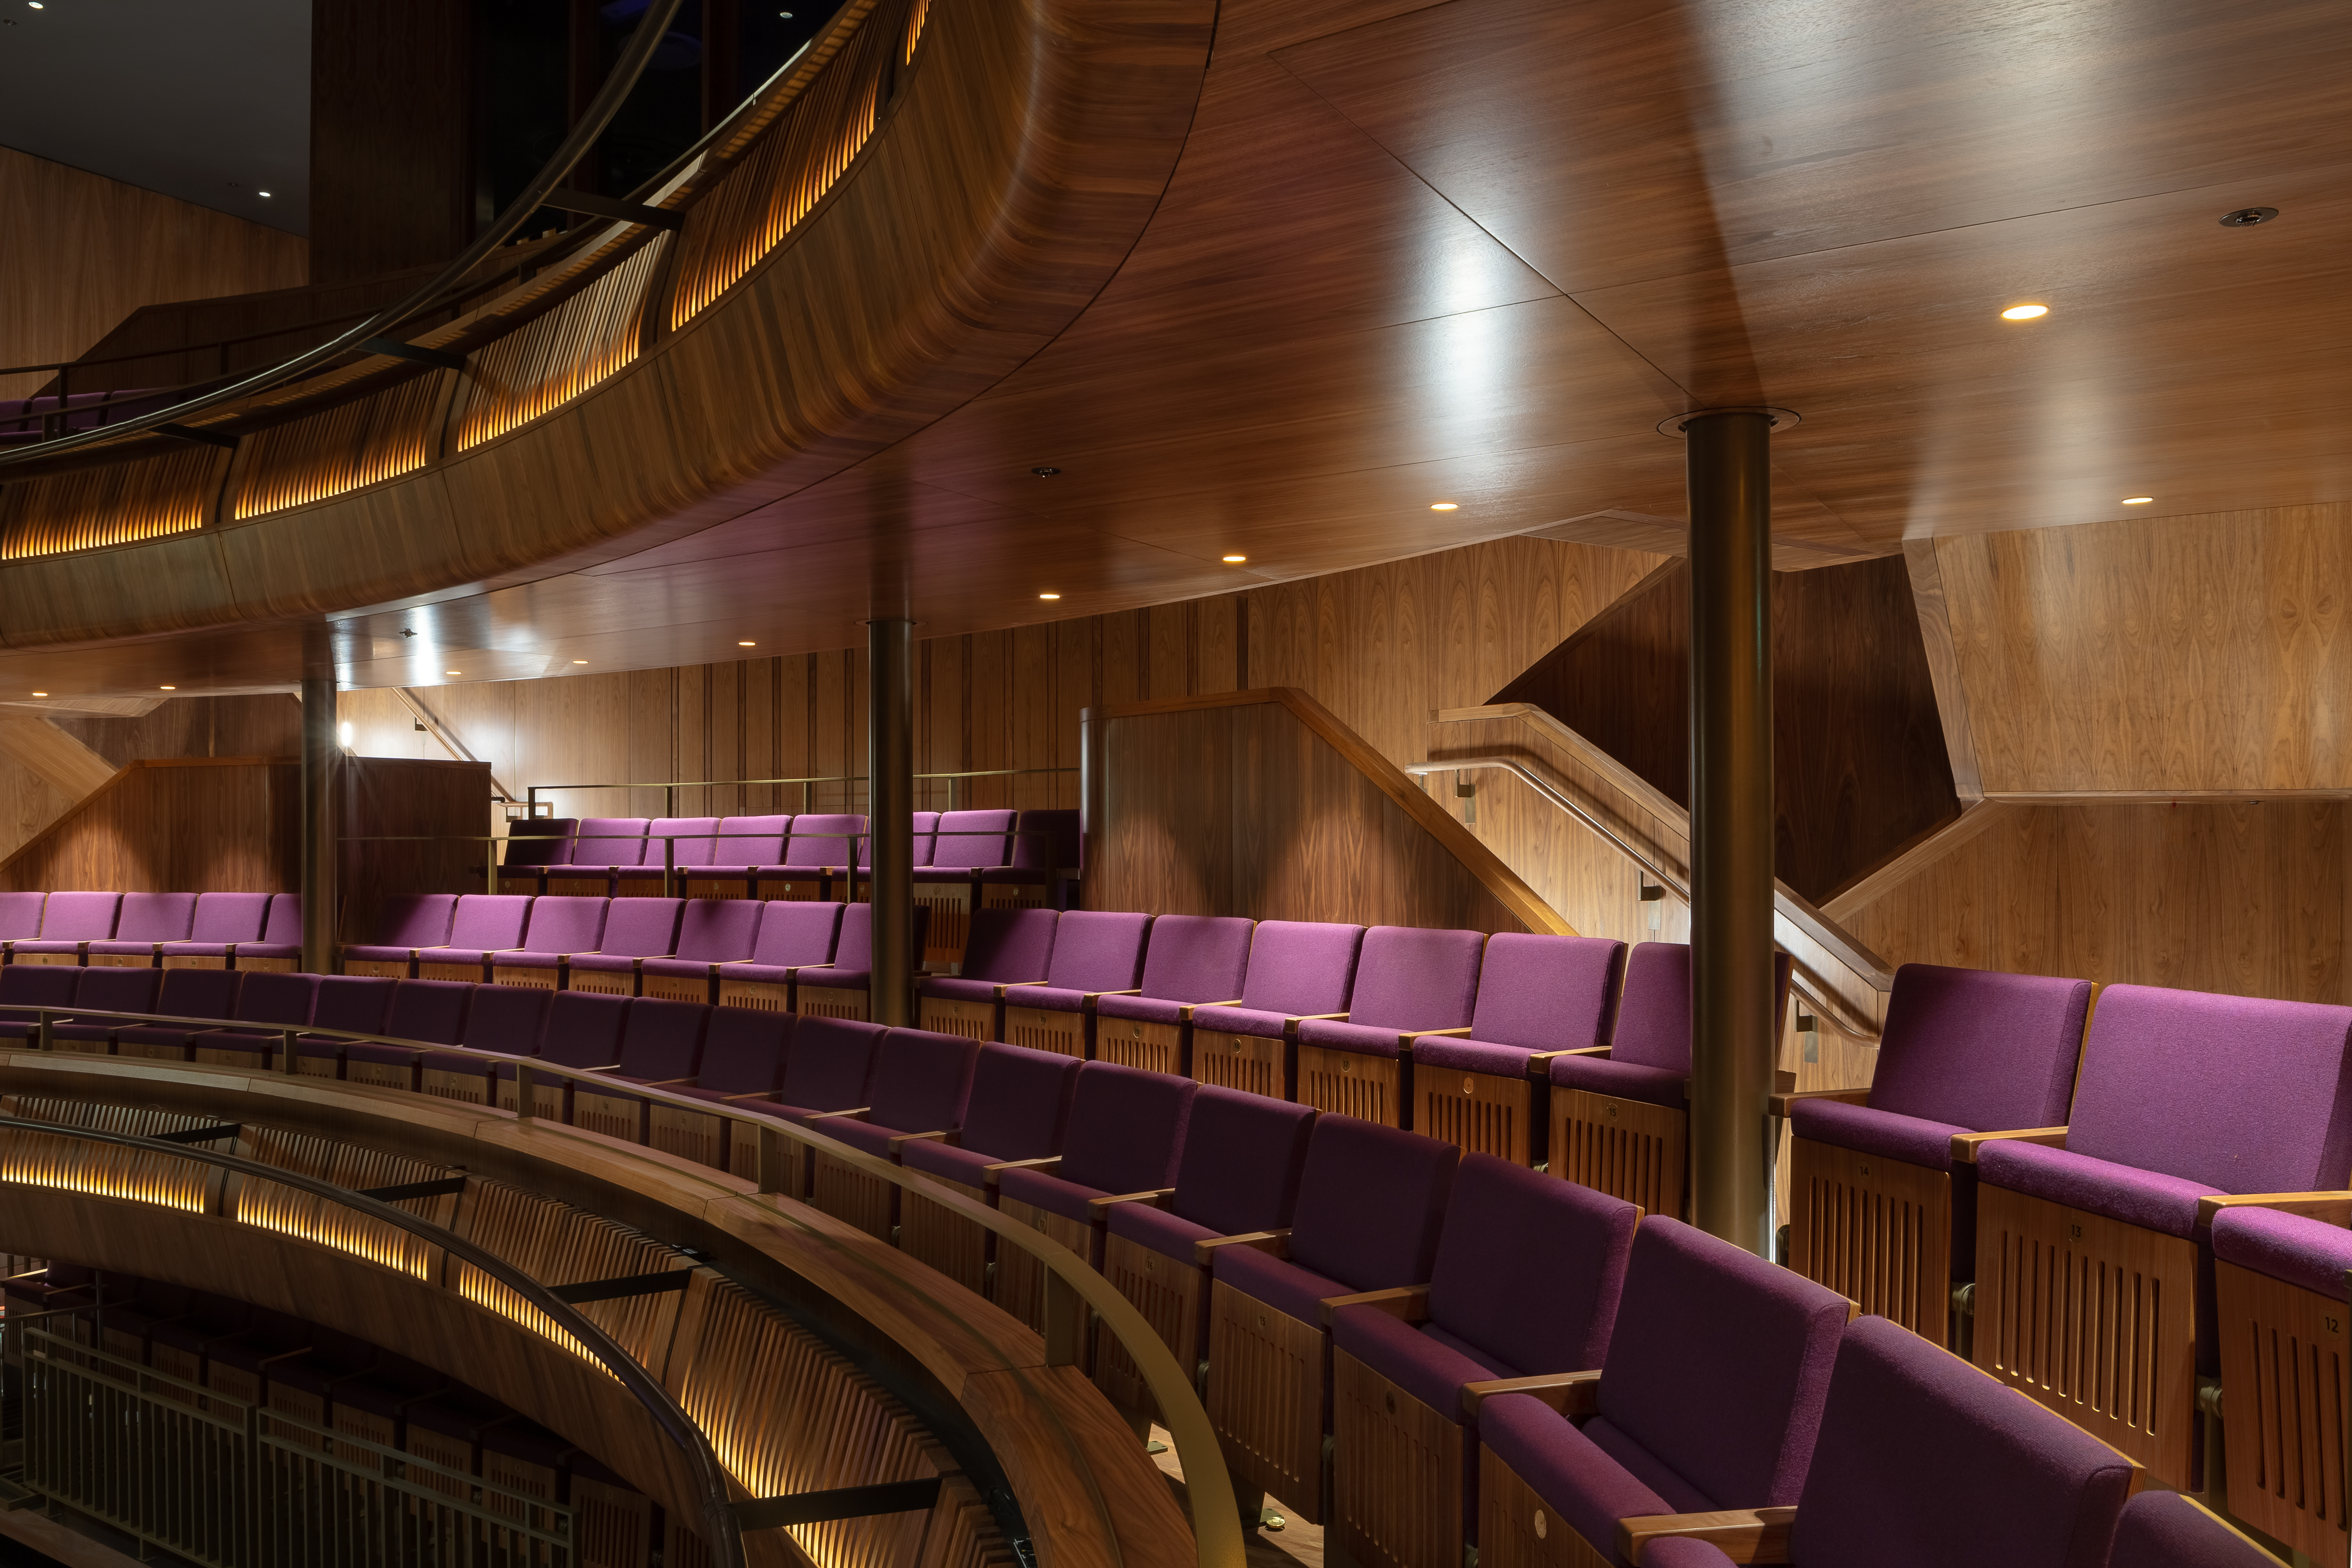 <p>Royal Opera House London &#8211; Stanton Williams, Studio Linse. beeld Luke Hayes</p>